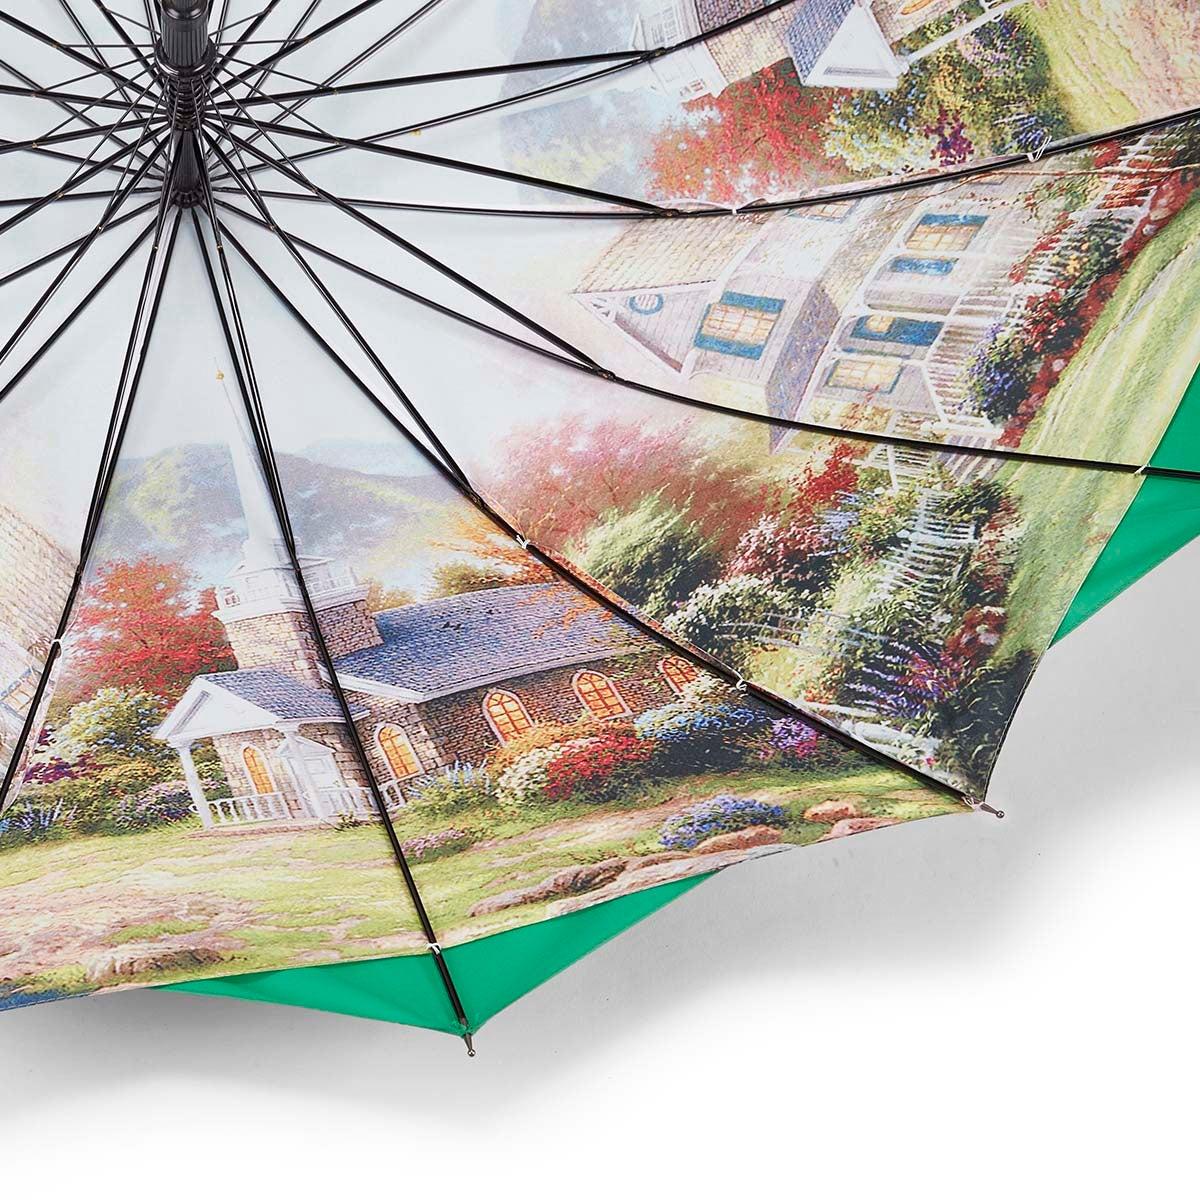 Austin House Panel Stick green umbrella